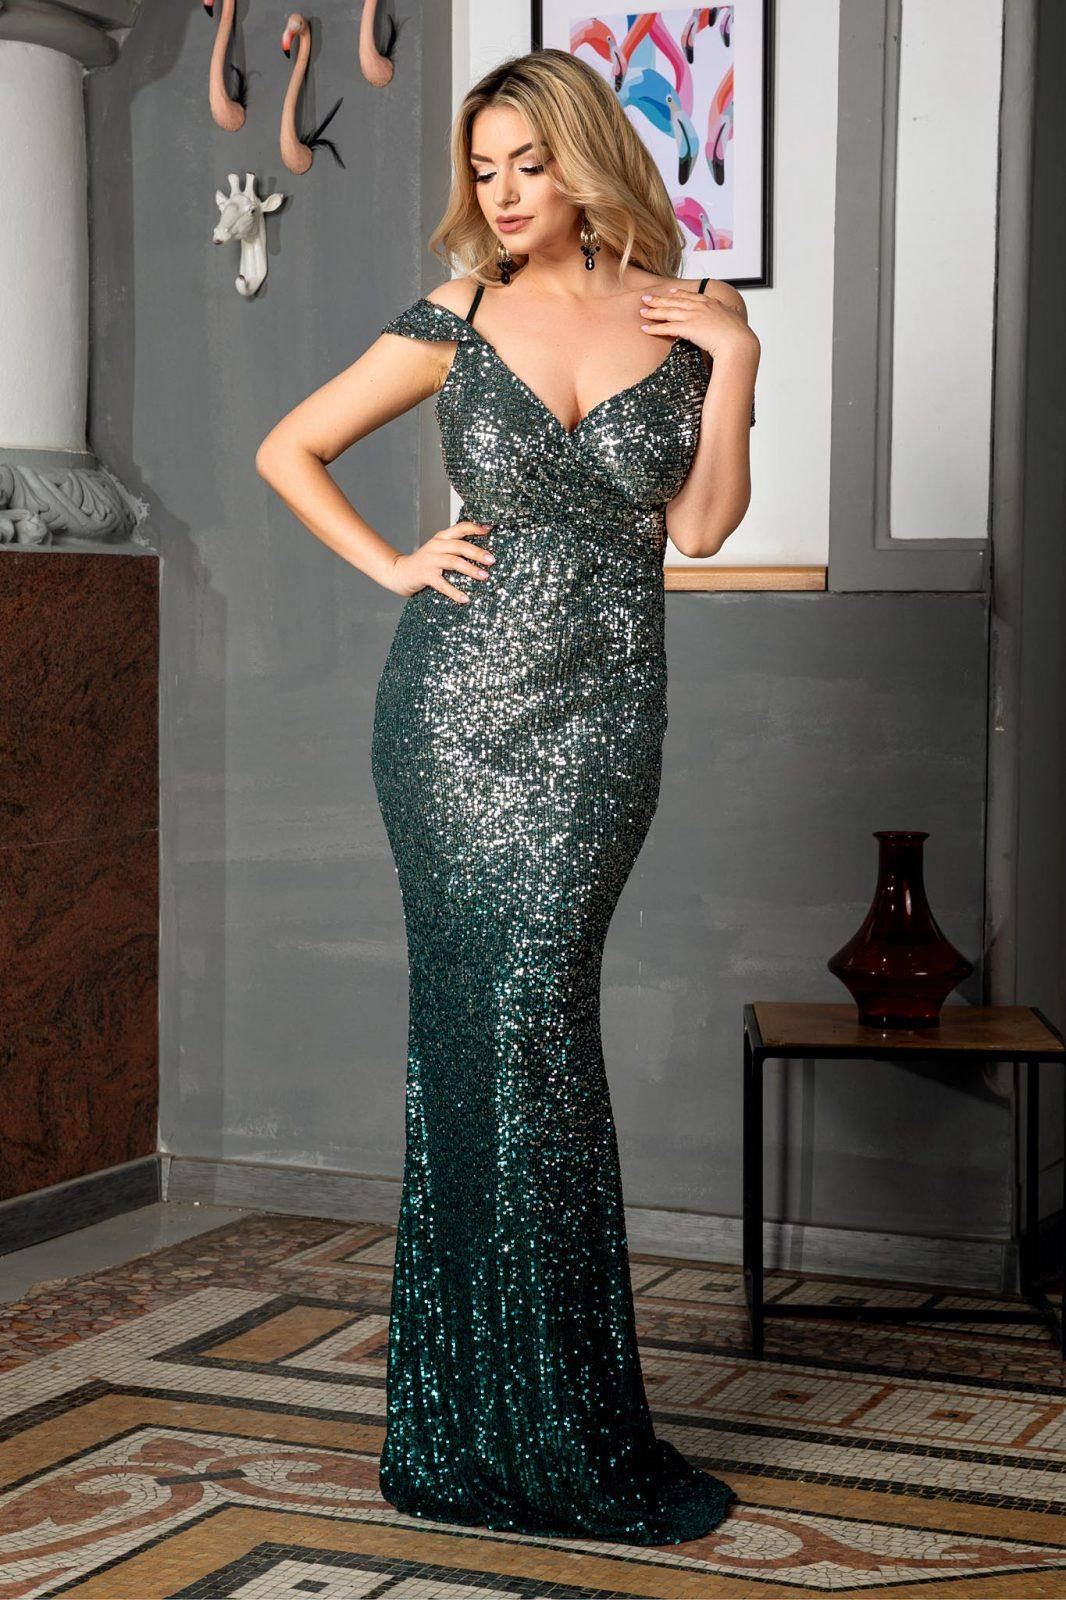 Sensual Green Dress